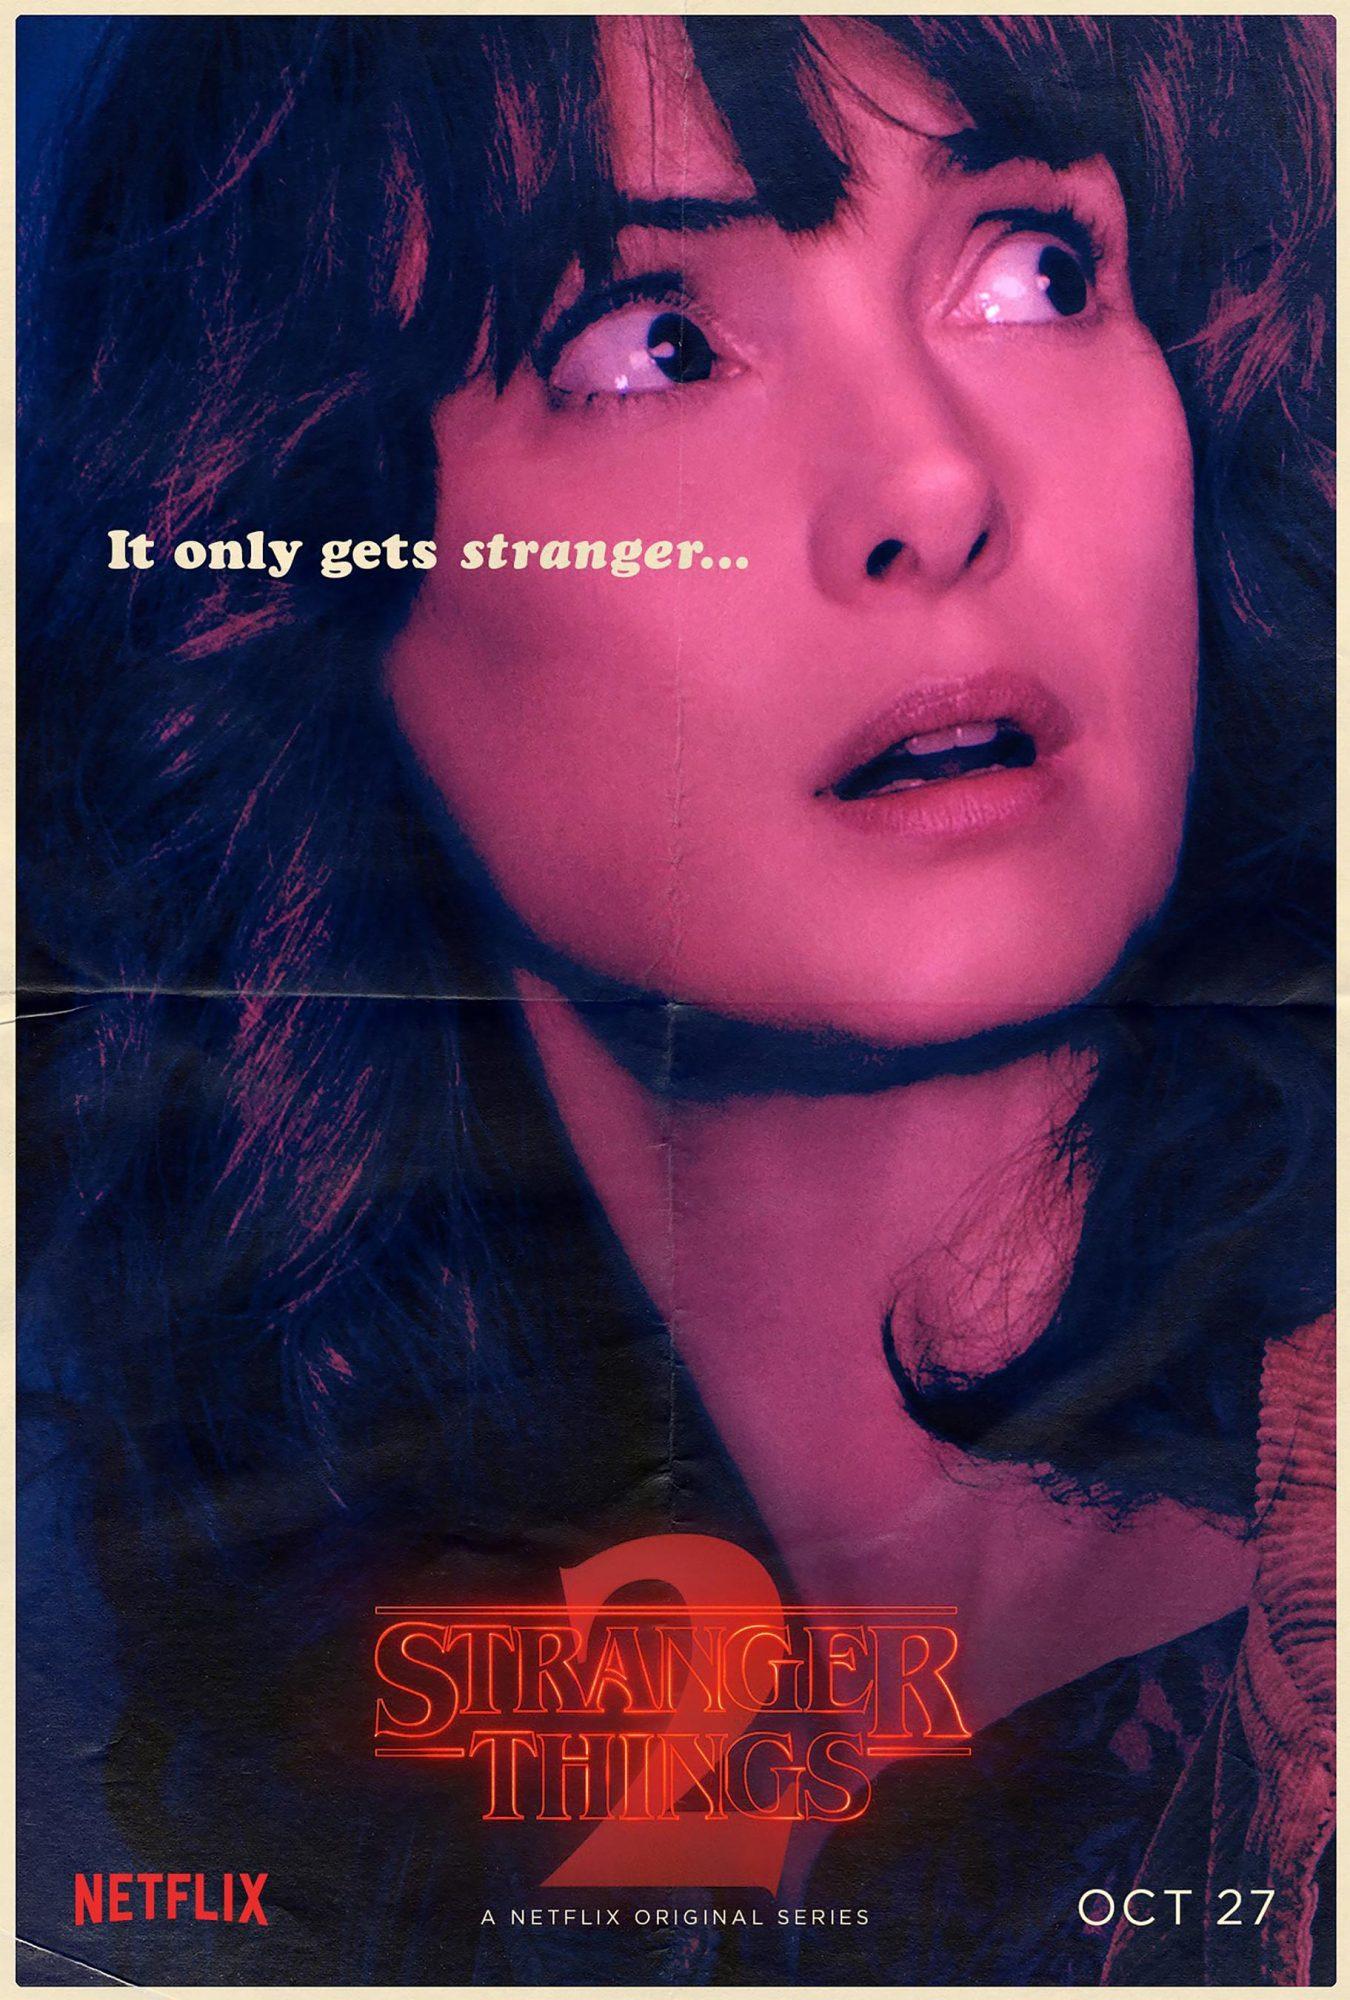 Stranger Things Season 2 - Winona Ryder CR: Netflix